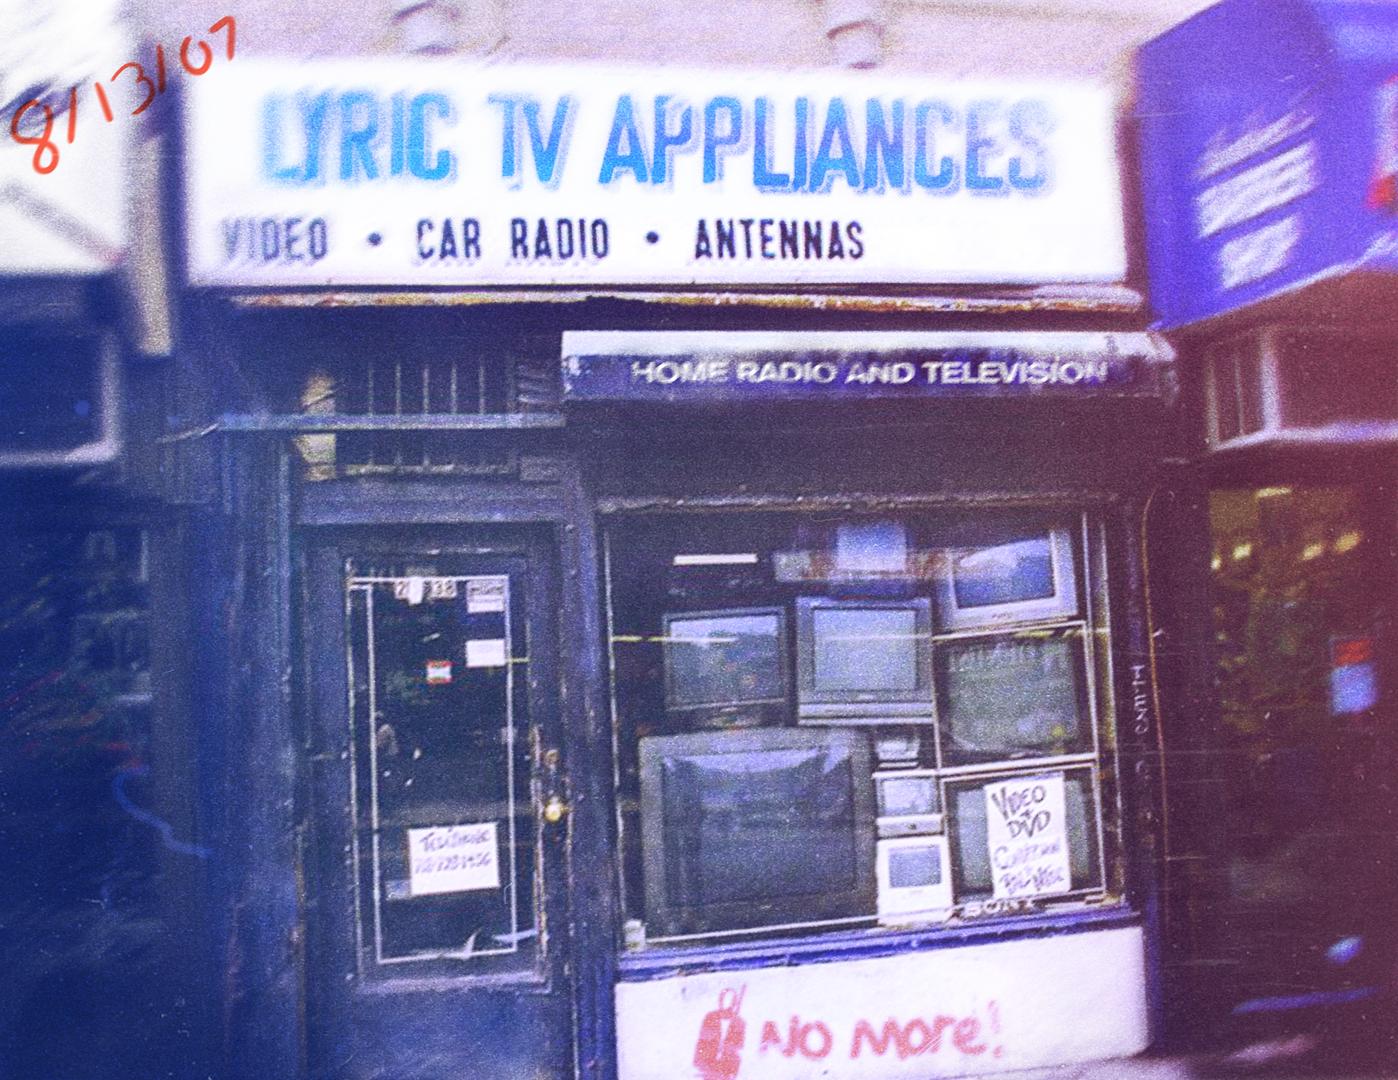 Lyric Television Appliances